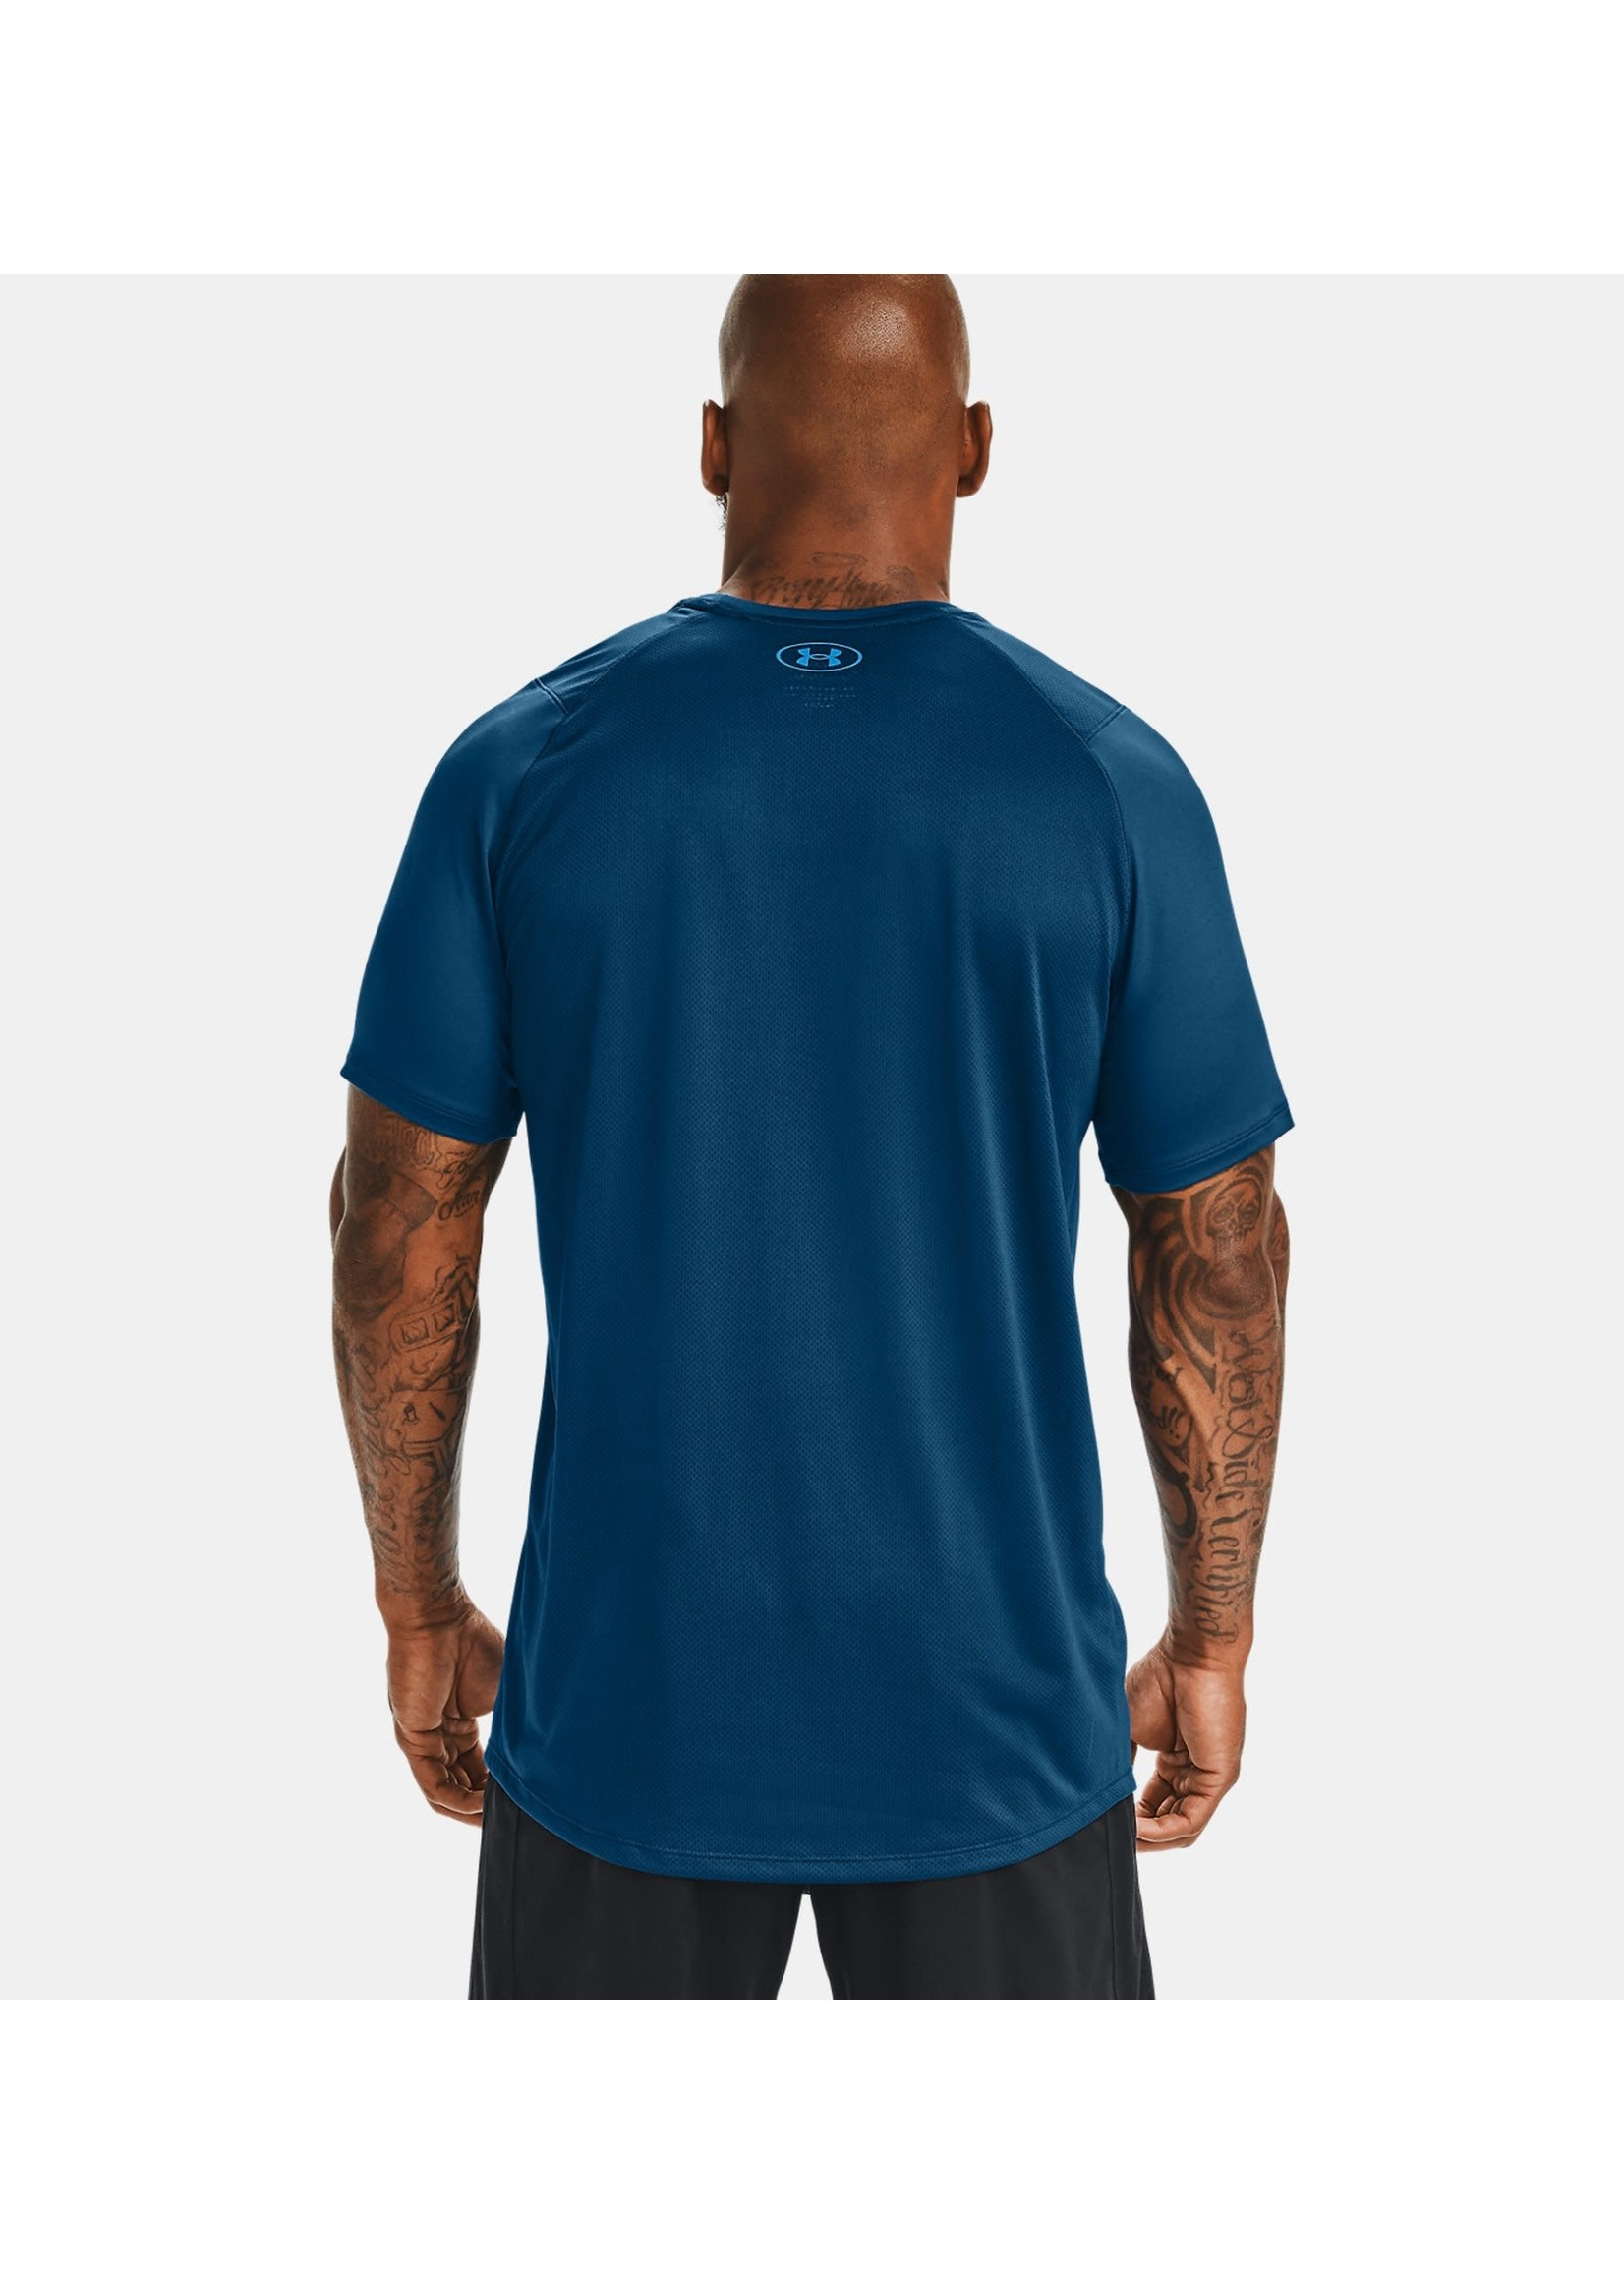 UNDER ARMOUR T-shirt MK-1 Originators